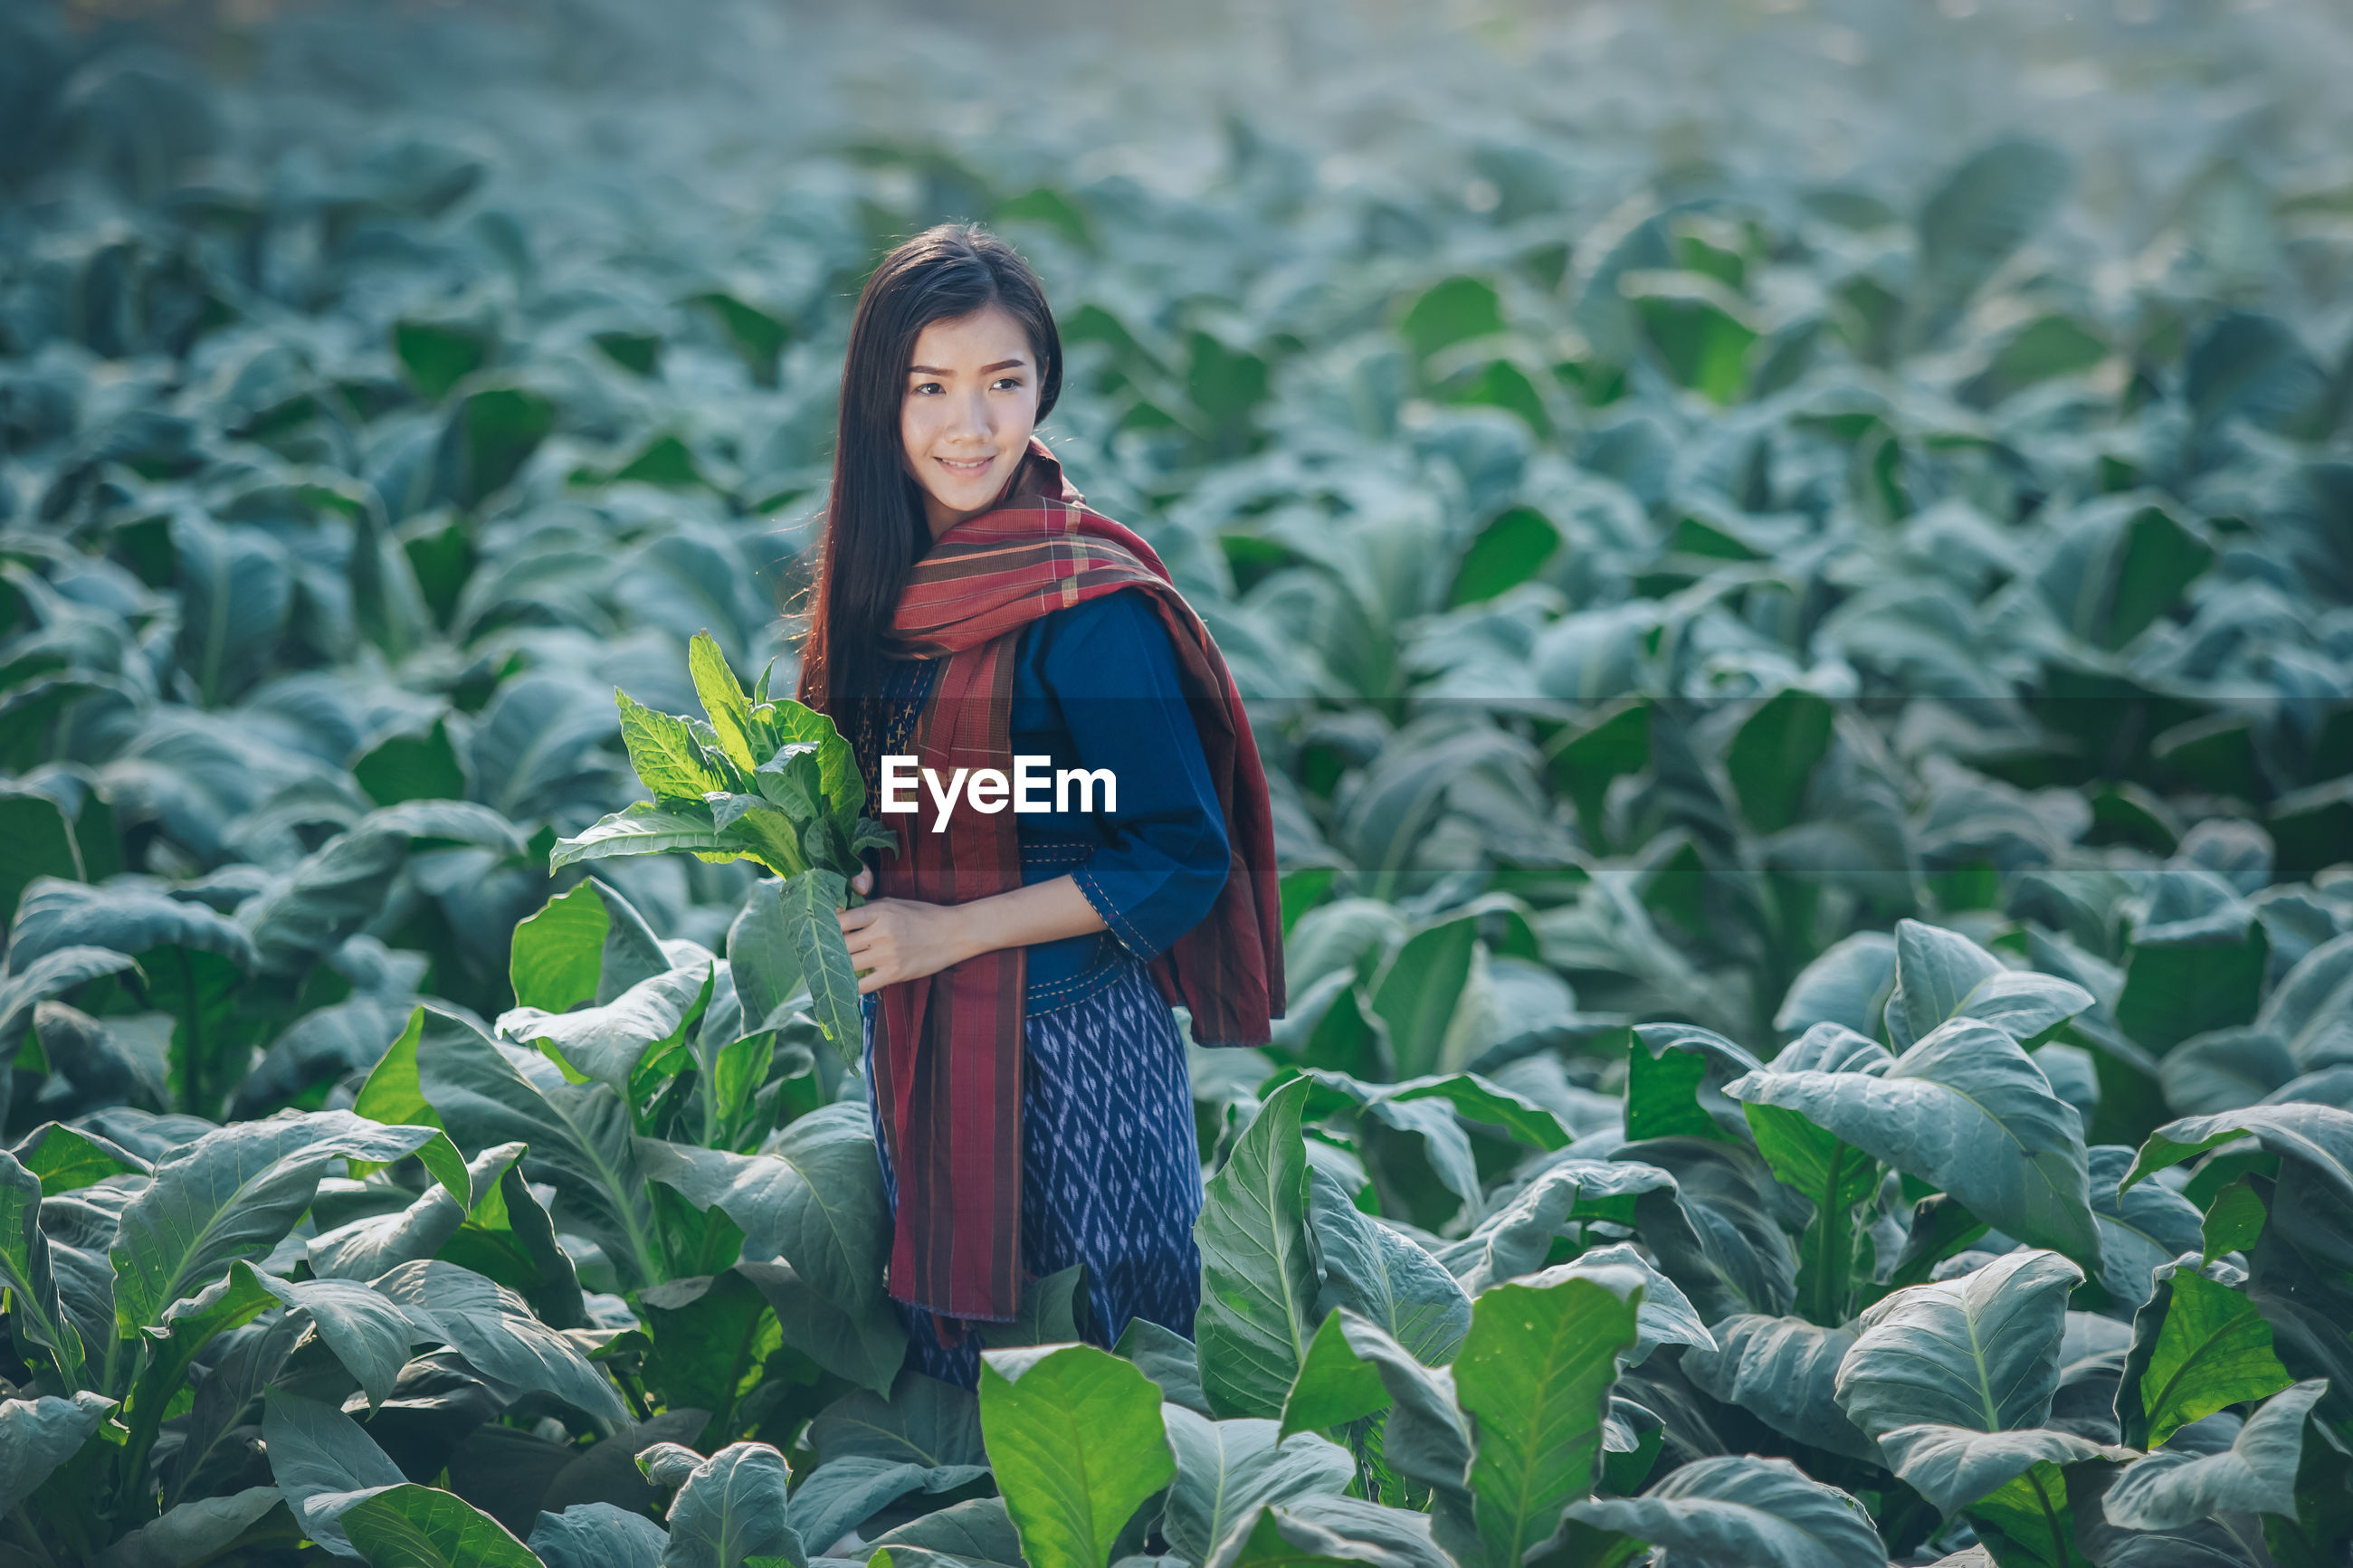 PORTRAIT OF WOMAN STANDING ON PLANTS